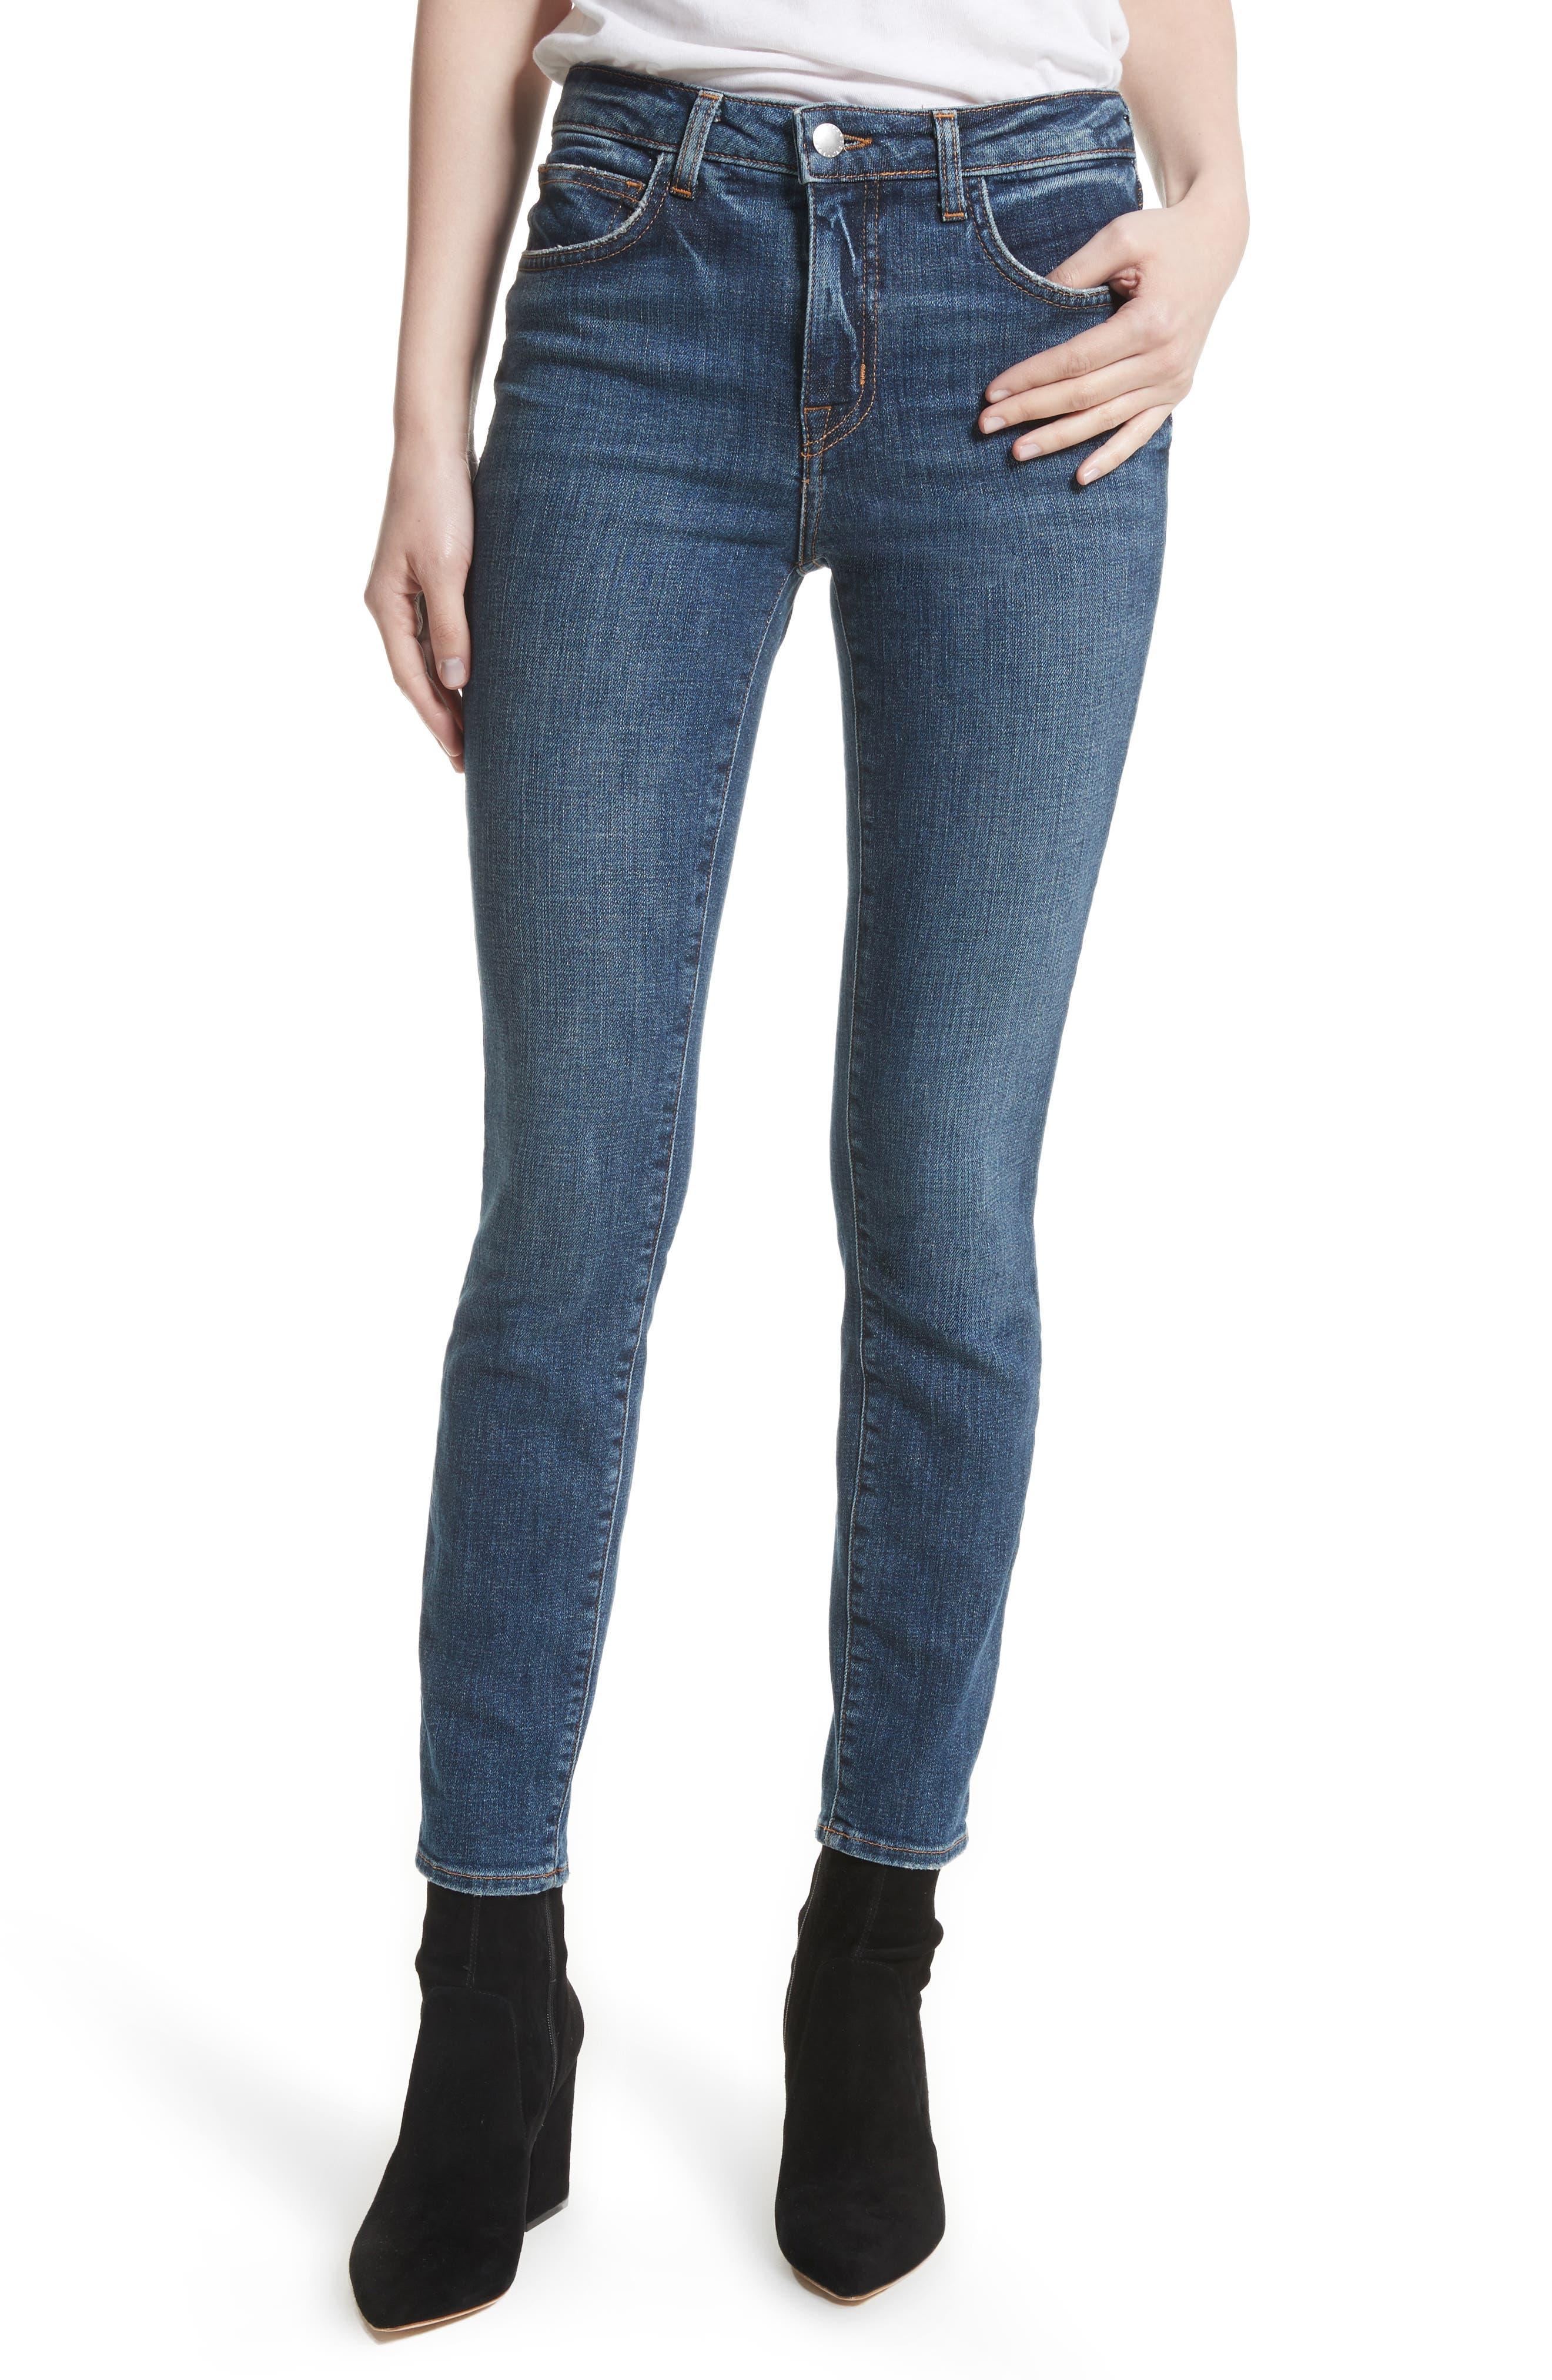 L'AGENCE High 10 High Waist Skinny Jeans